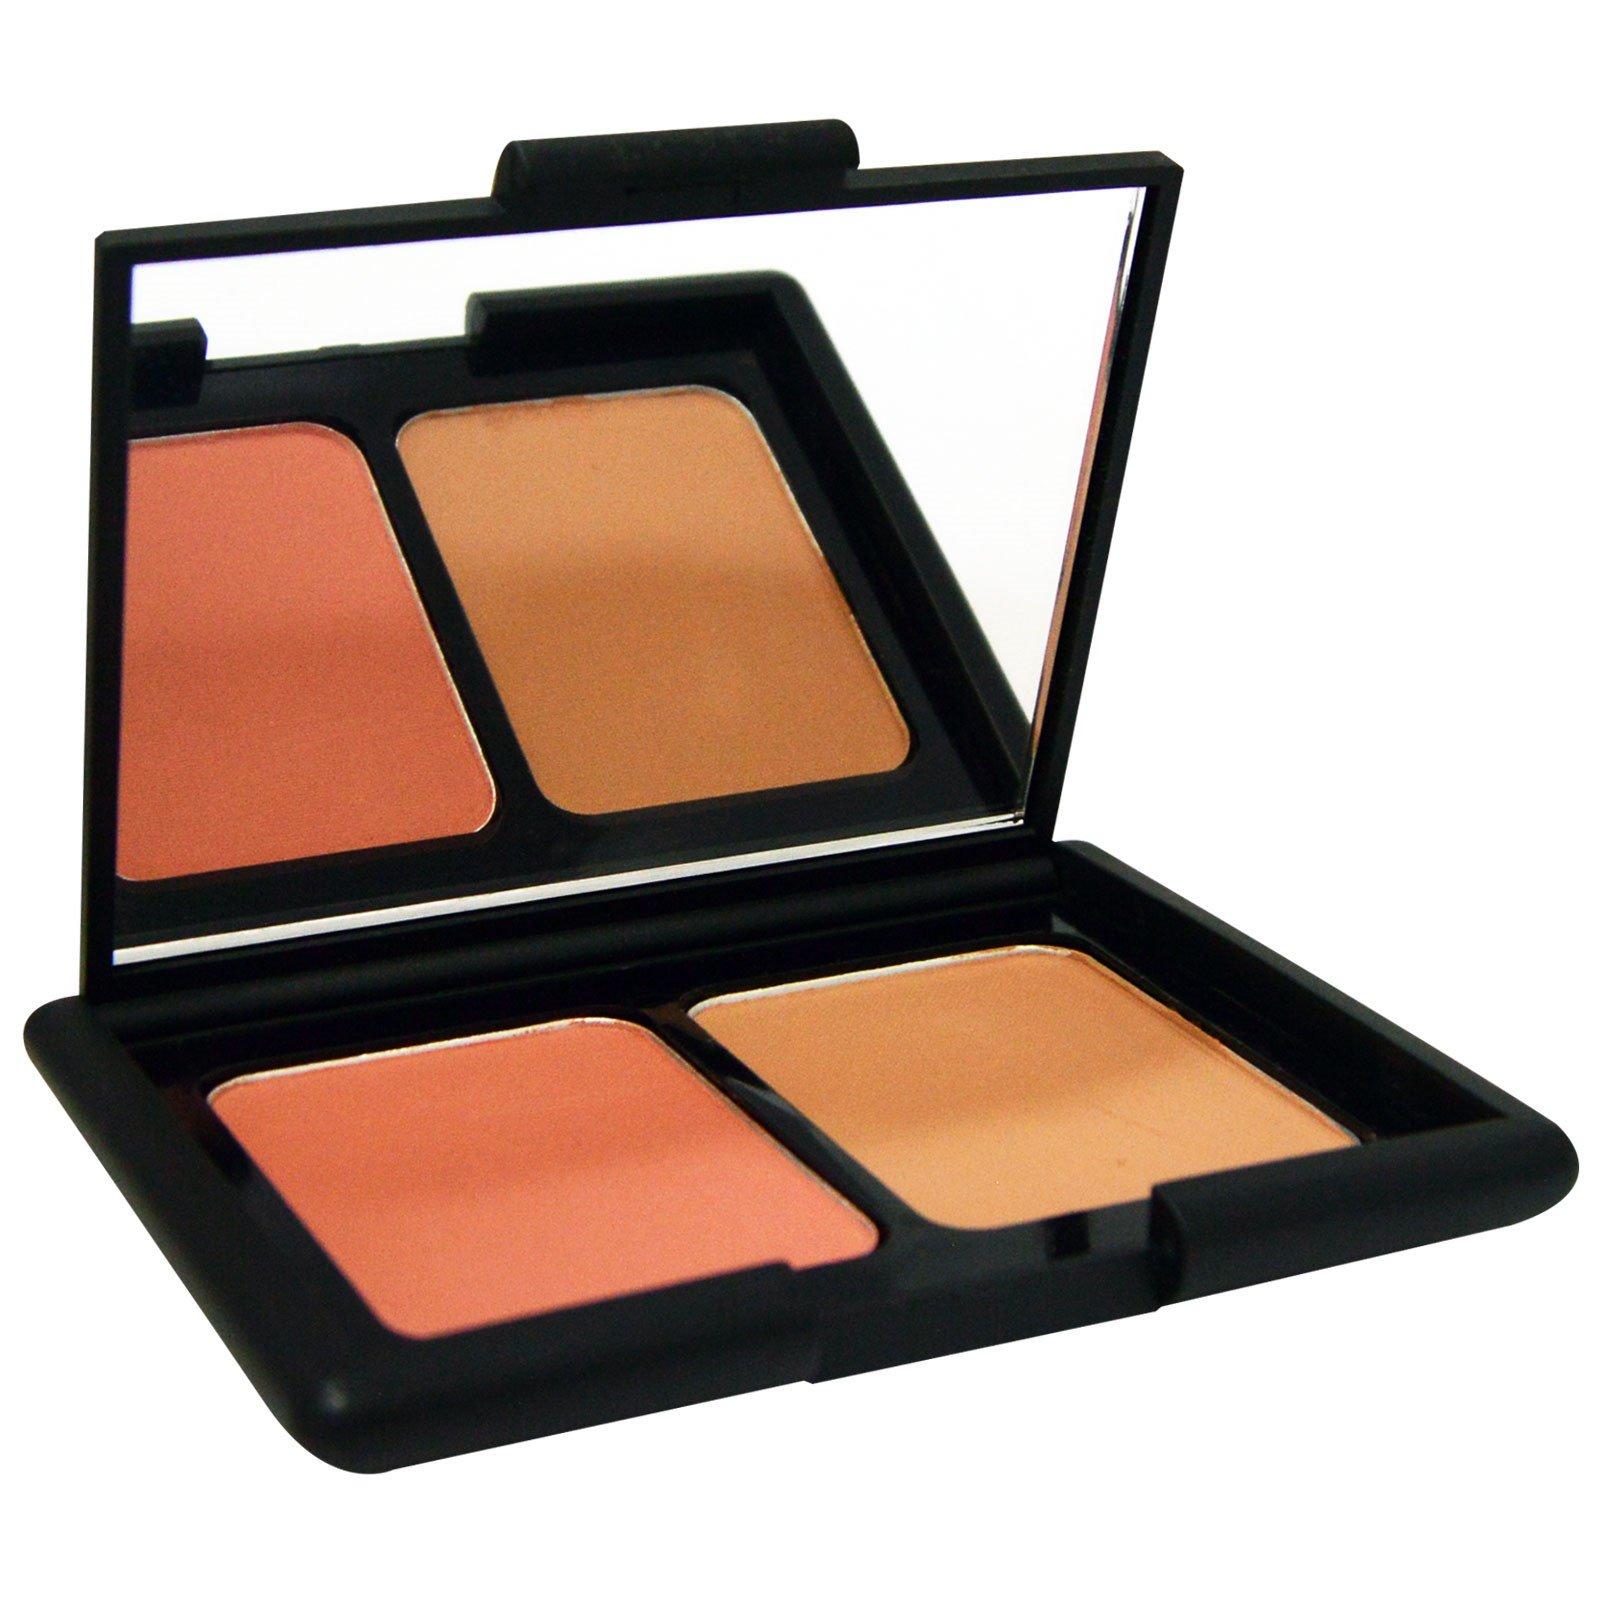 E.L.F. Cosmetics, Contouring Blush & Bronzing Powder, Fiji-Matte, 0.30 oz (pack of 1)